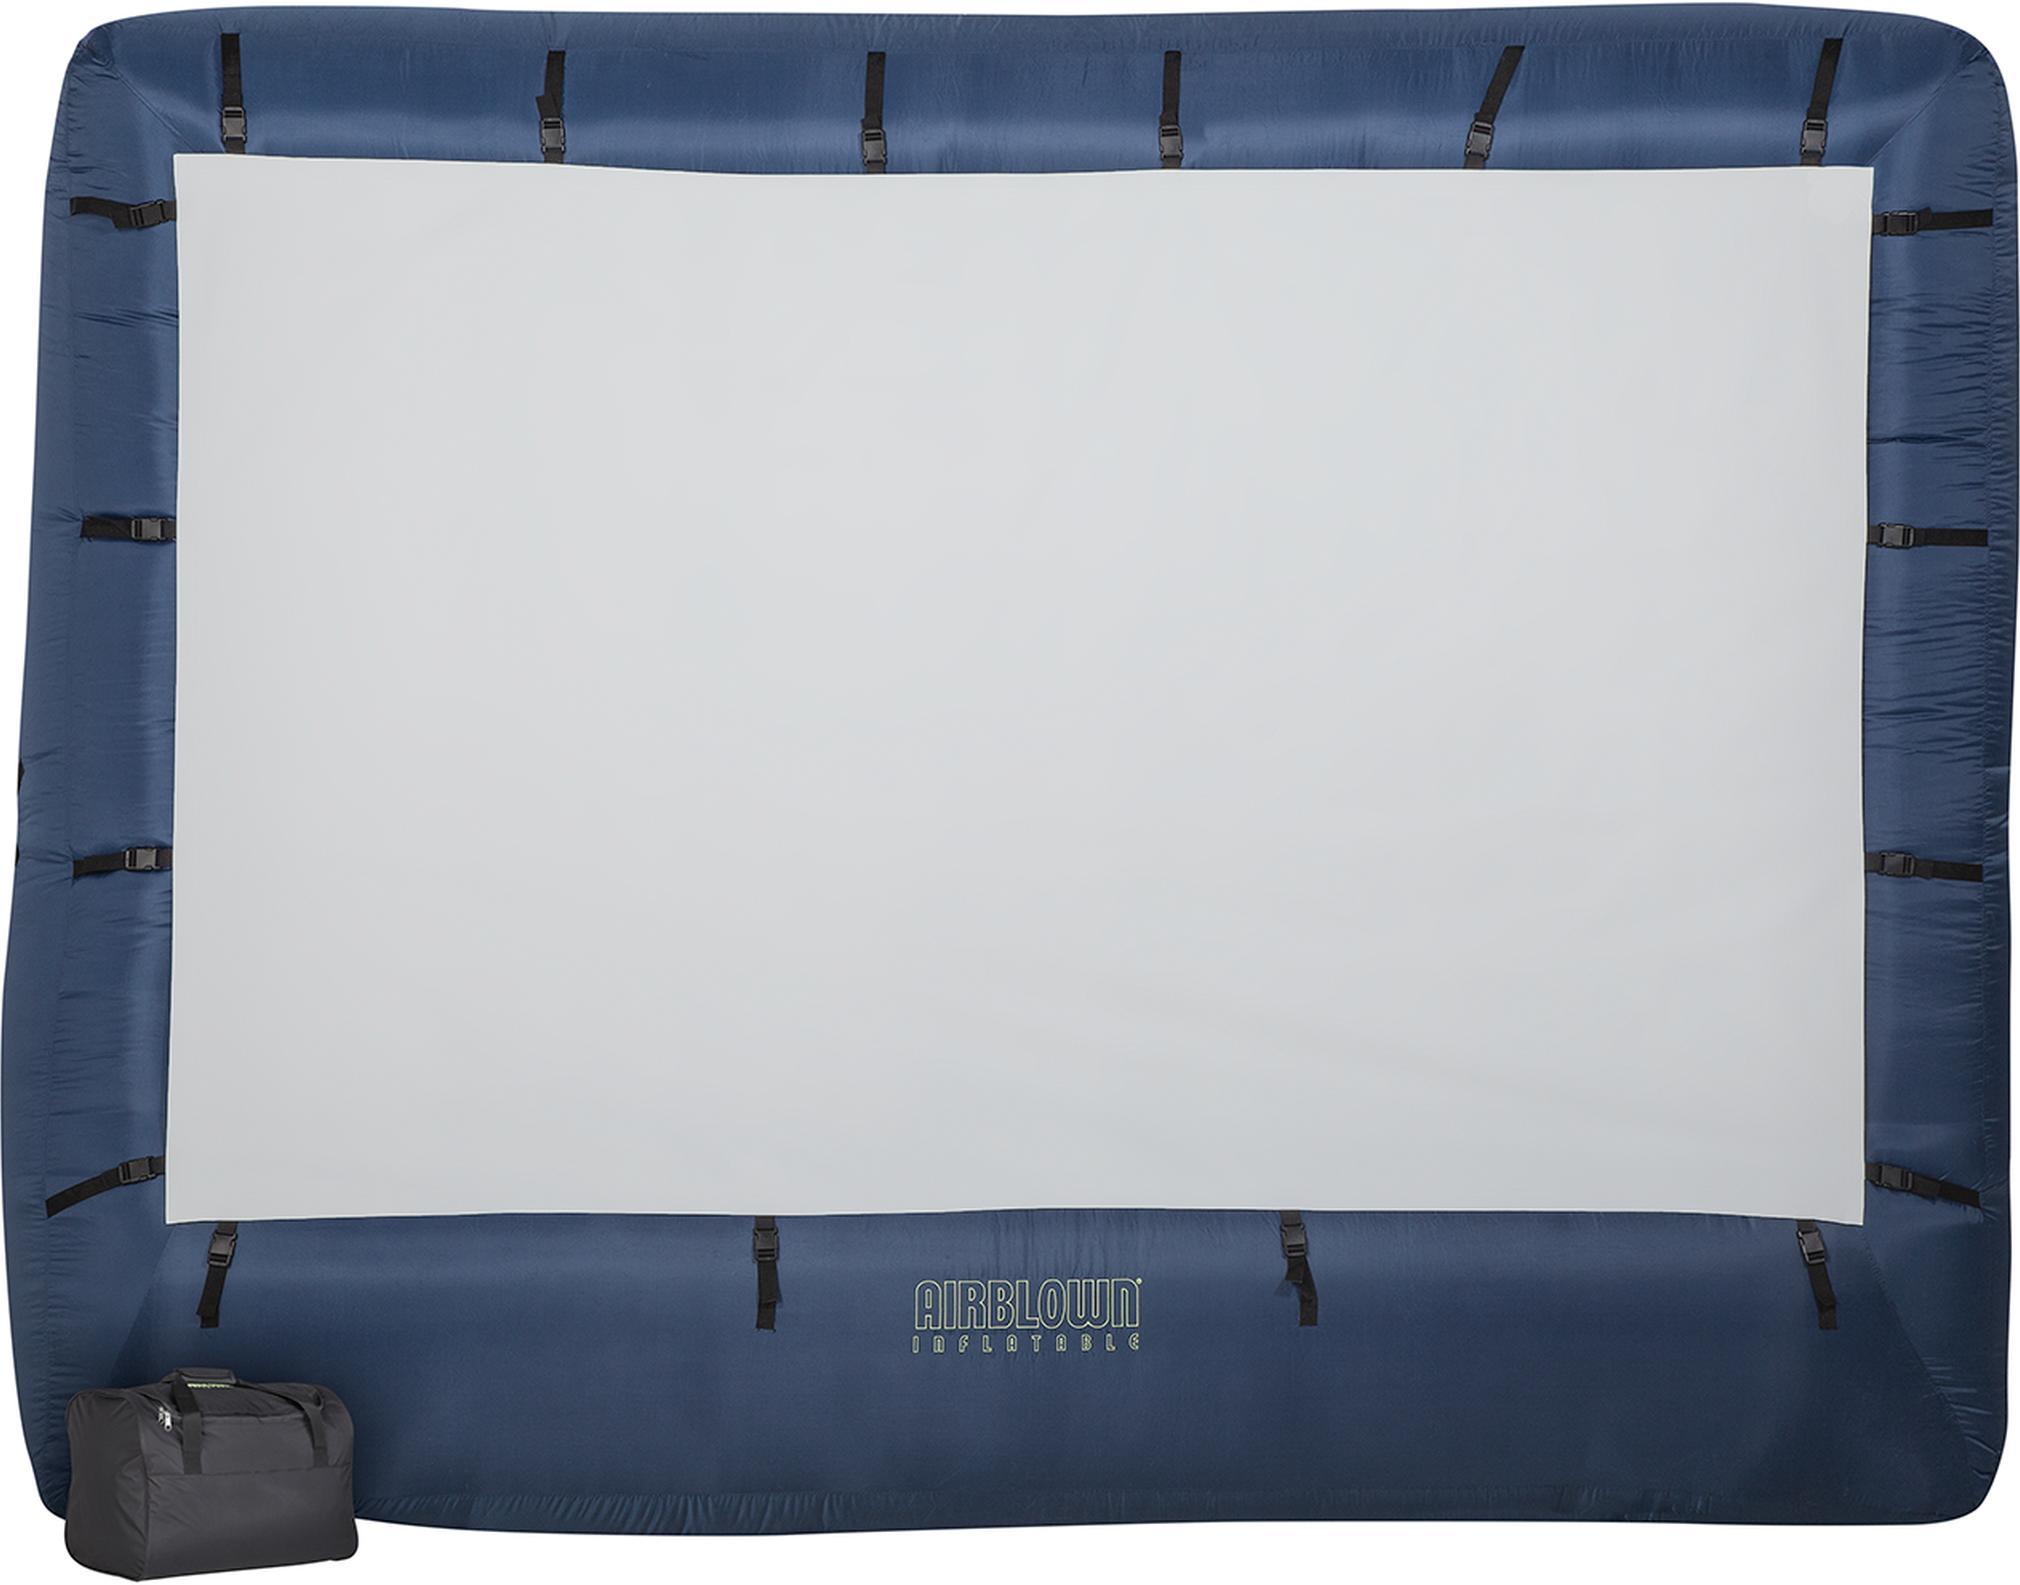 The best outdoor projector screens of 2020